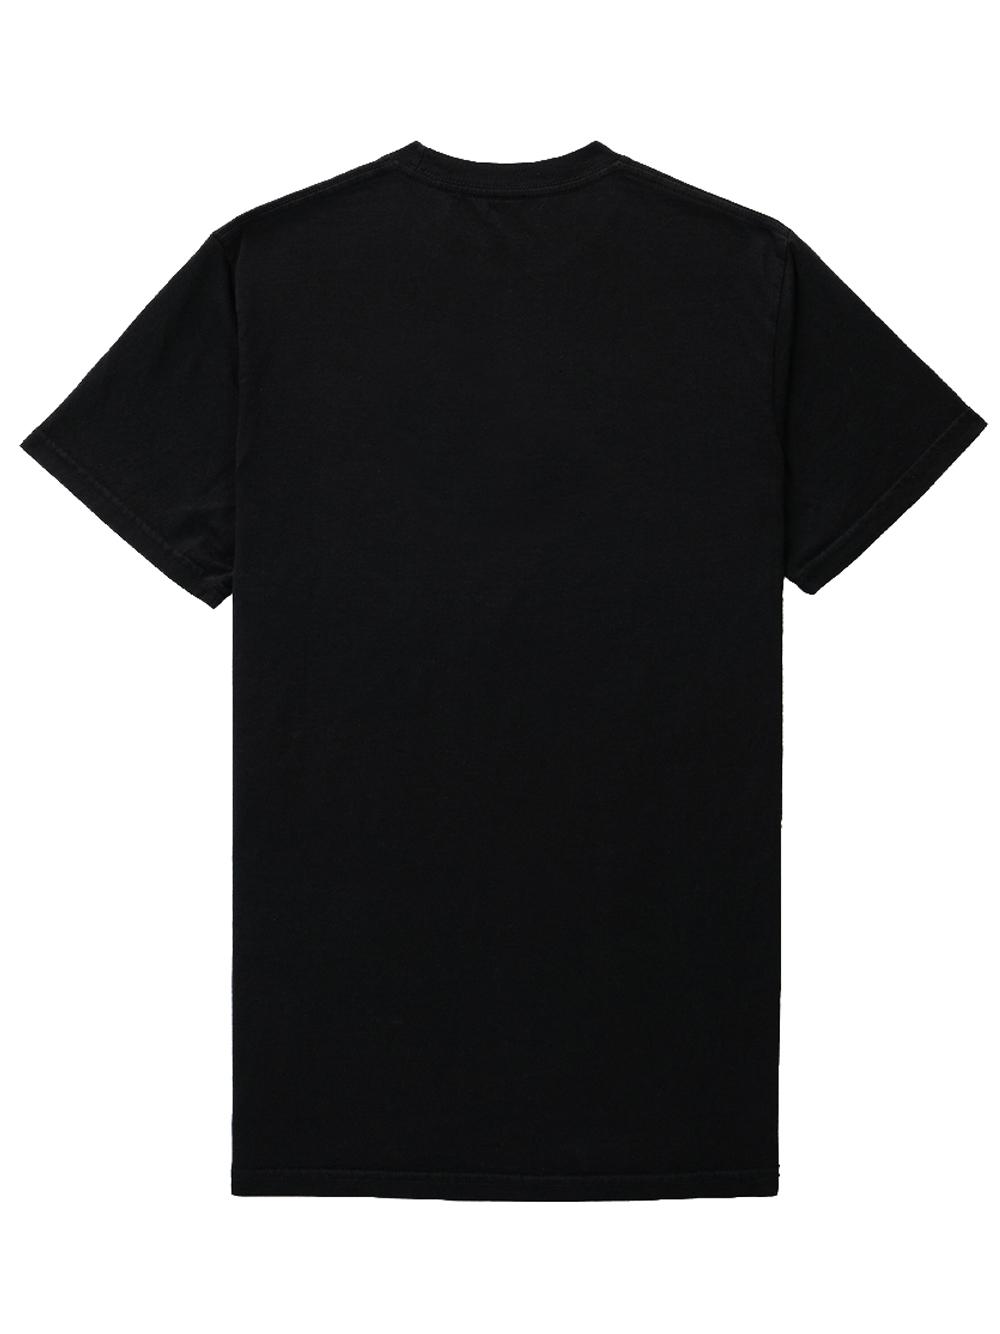 Src tennis T-shirt Black Man Cotton SPORTY & RICH | T-shirts | TS155BK